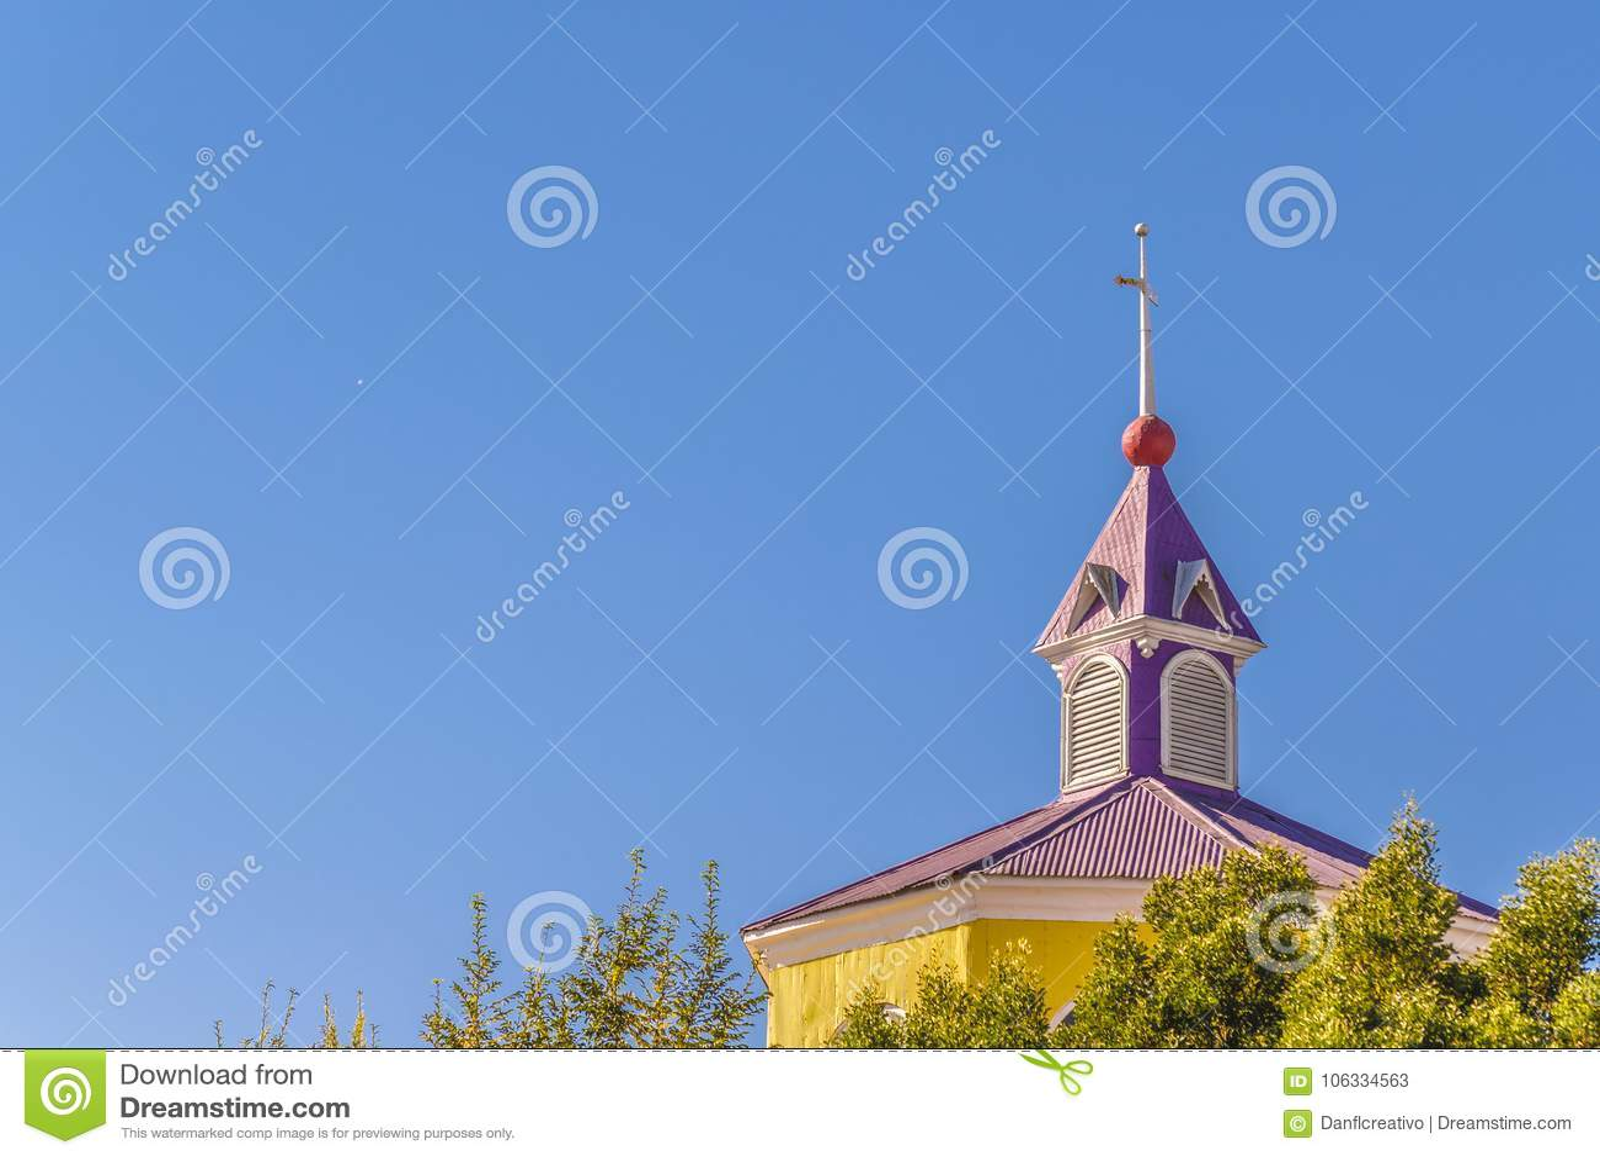 Iglesia Católica De Madera, Isla De Chiloe, Chile Imagen de archivo ...